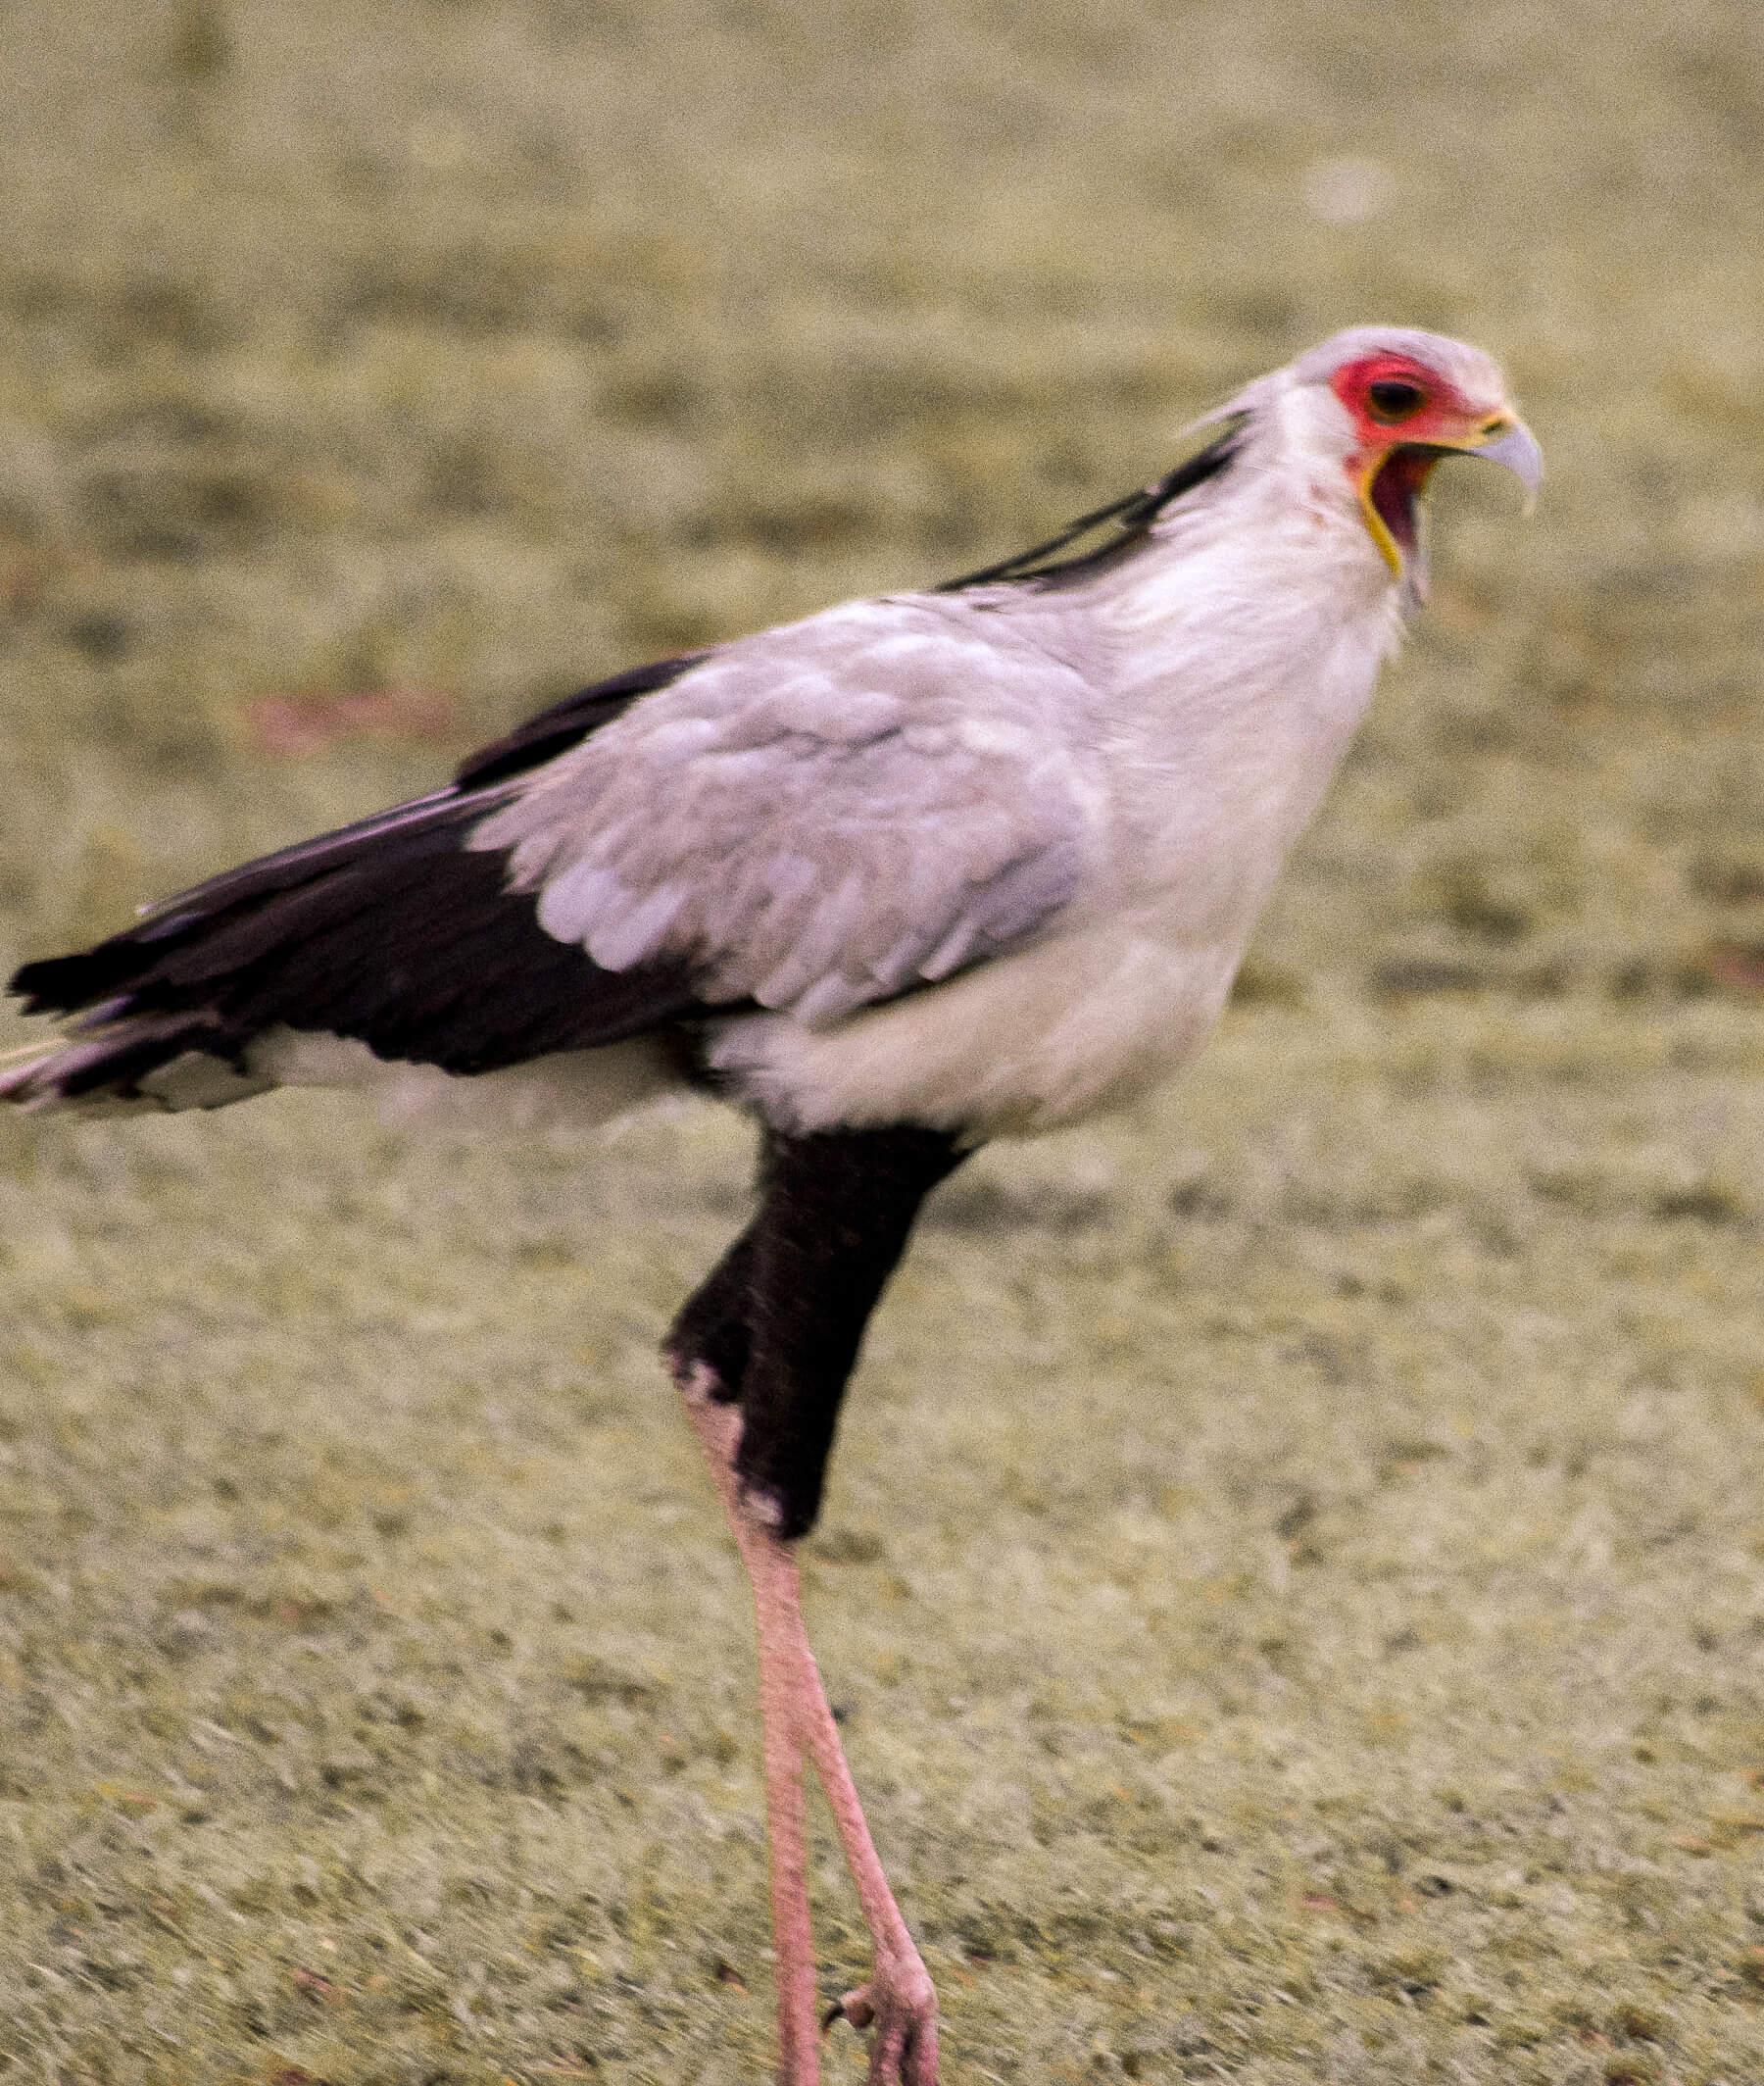 A secretary bird walking and squawking!